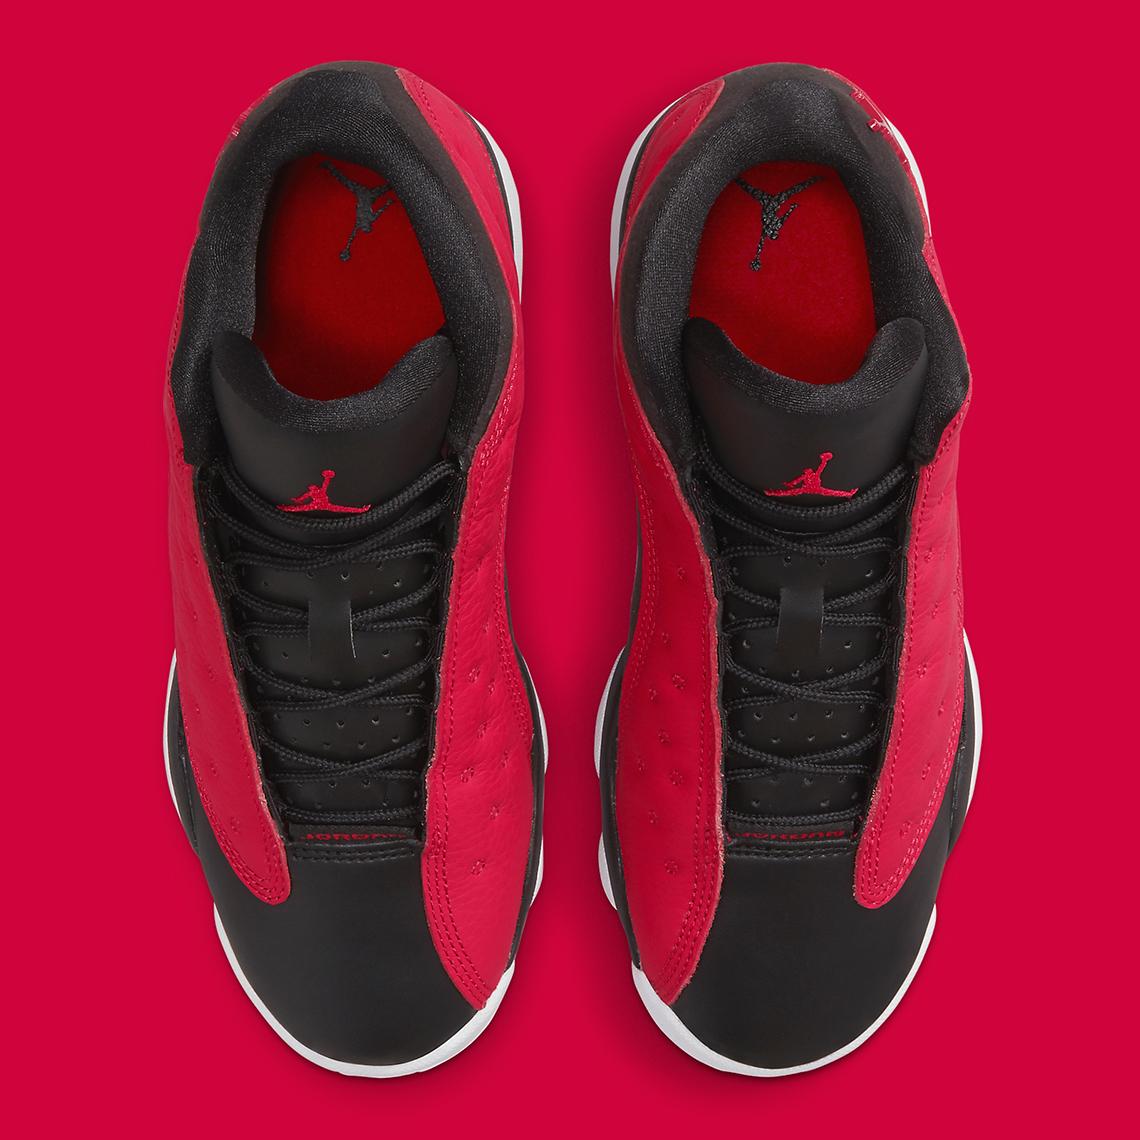 Air Jordan 13 Low GS Black Very Berry DA8019-061   SneakerNews.com